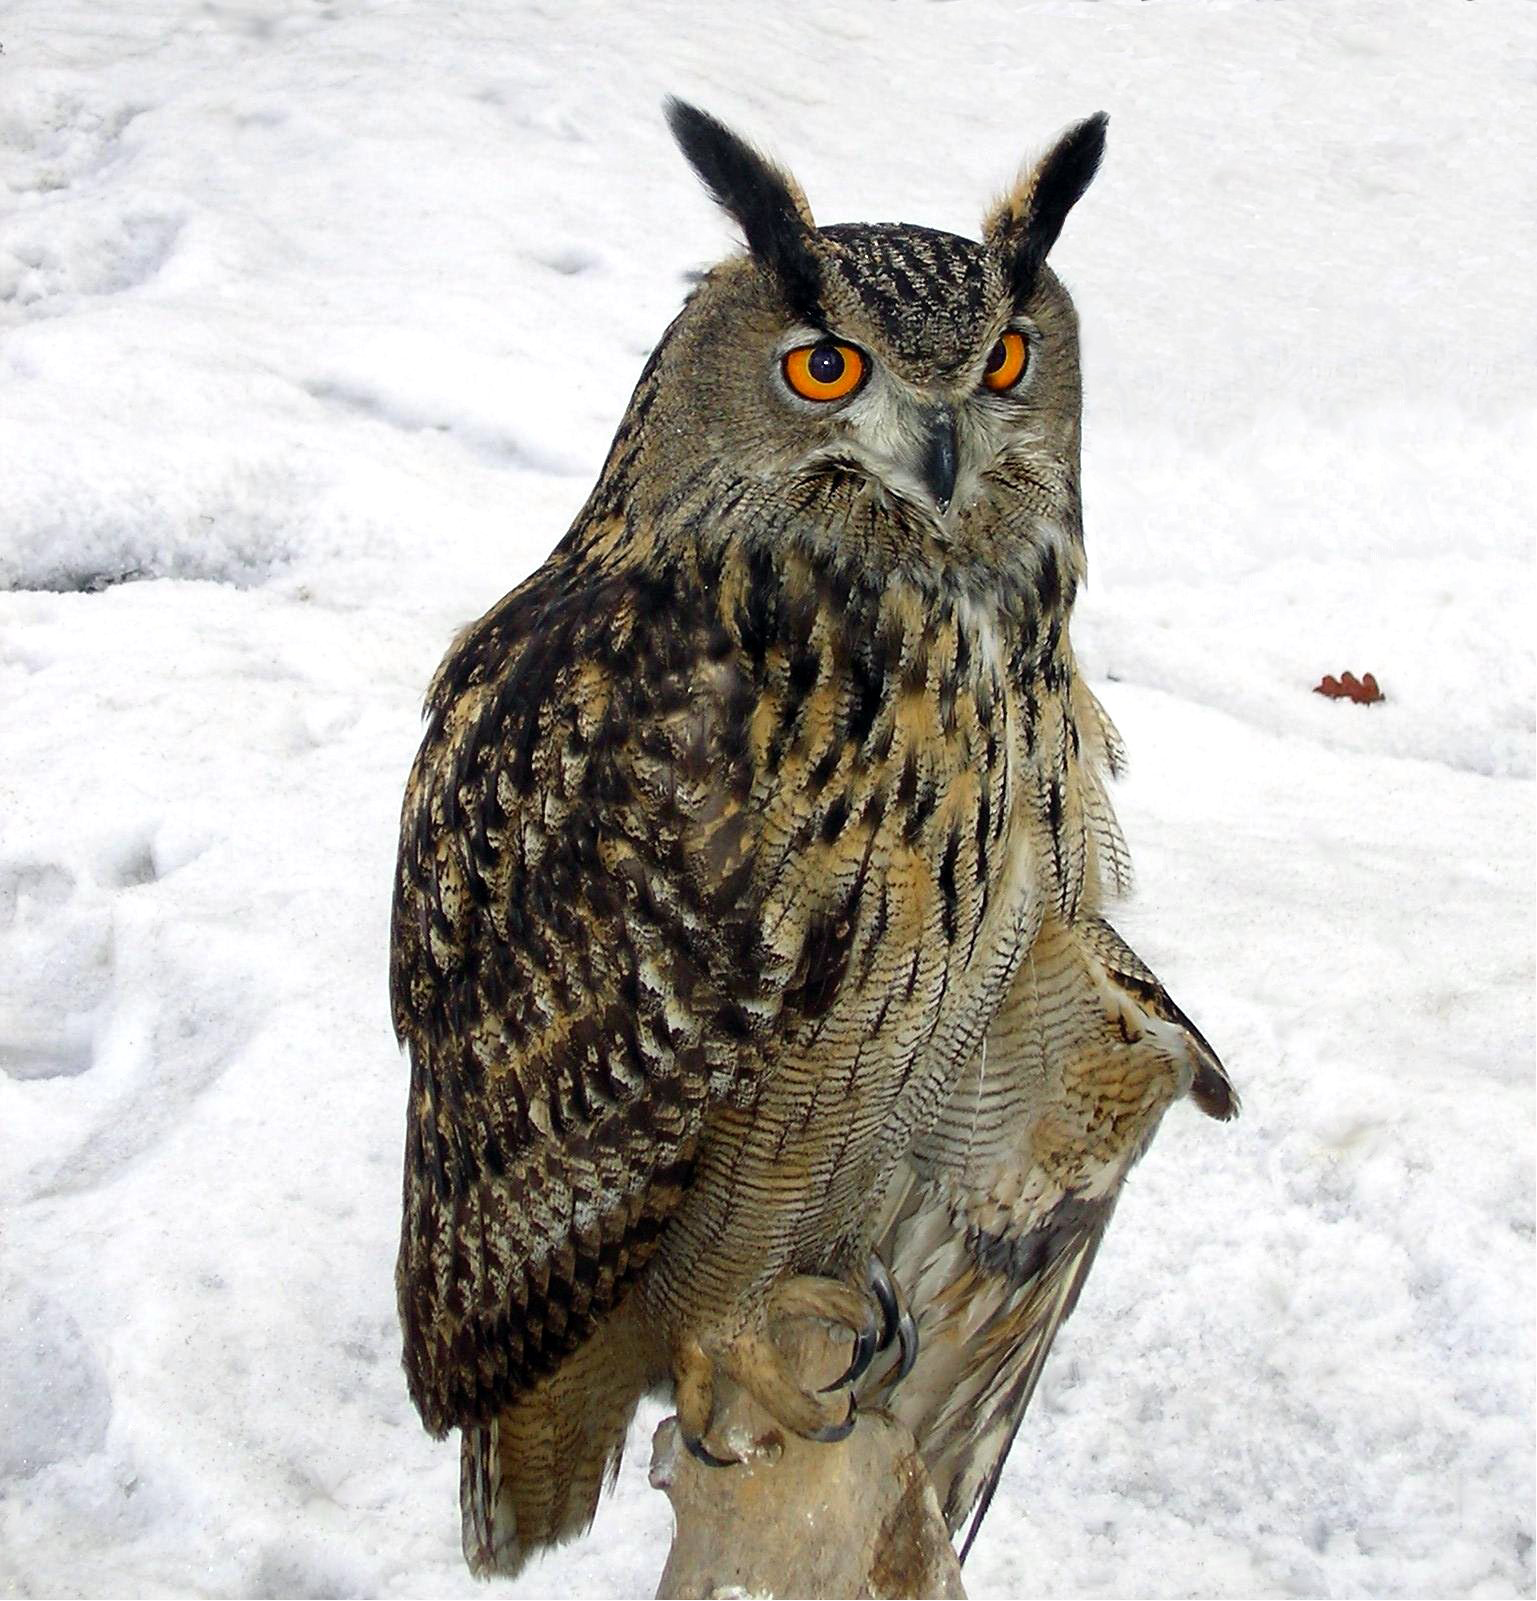 owl winter bird animal - photo #28